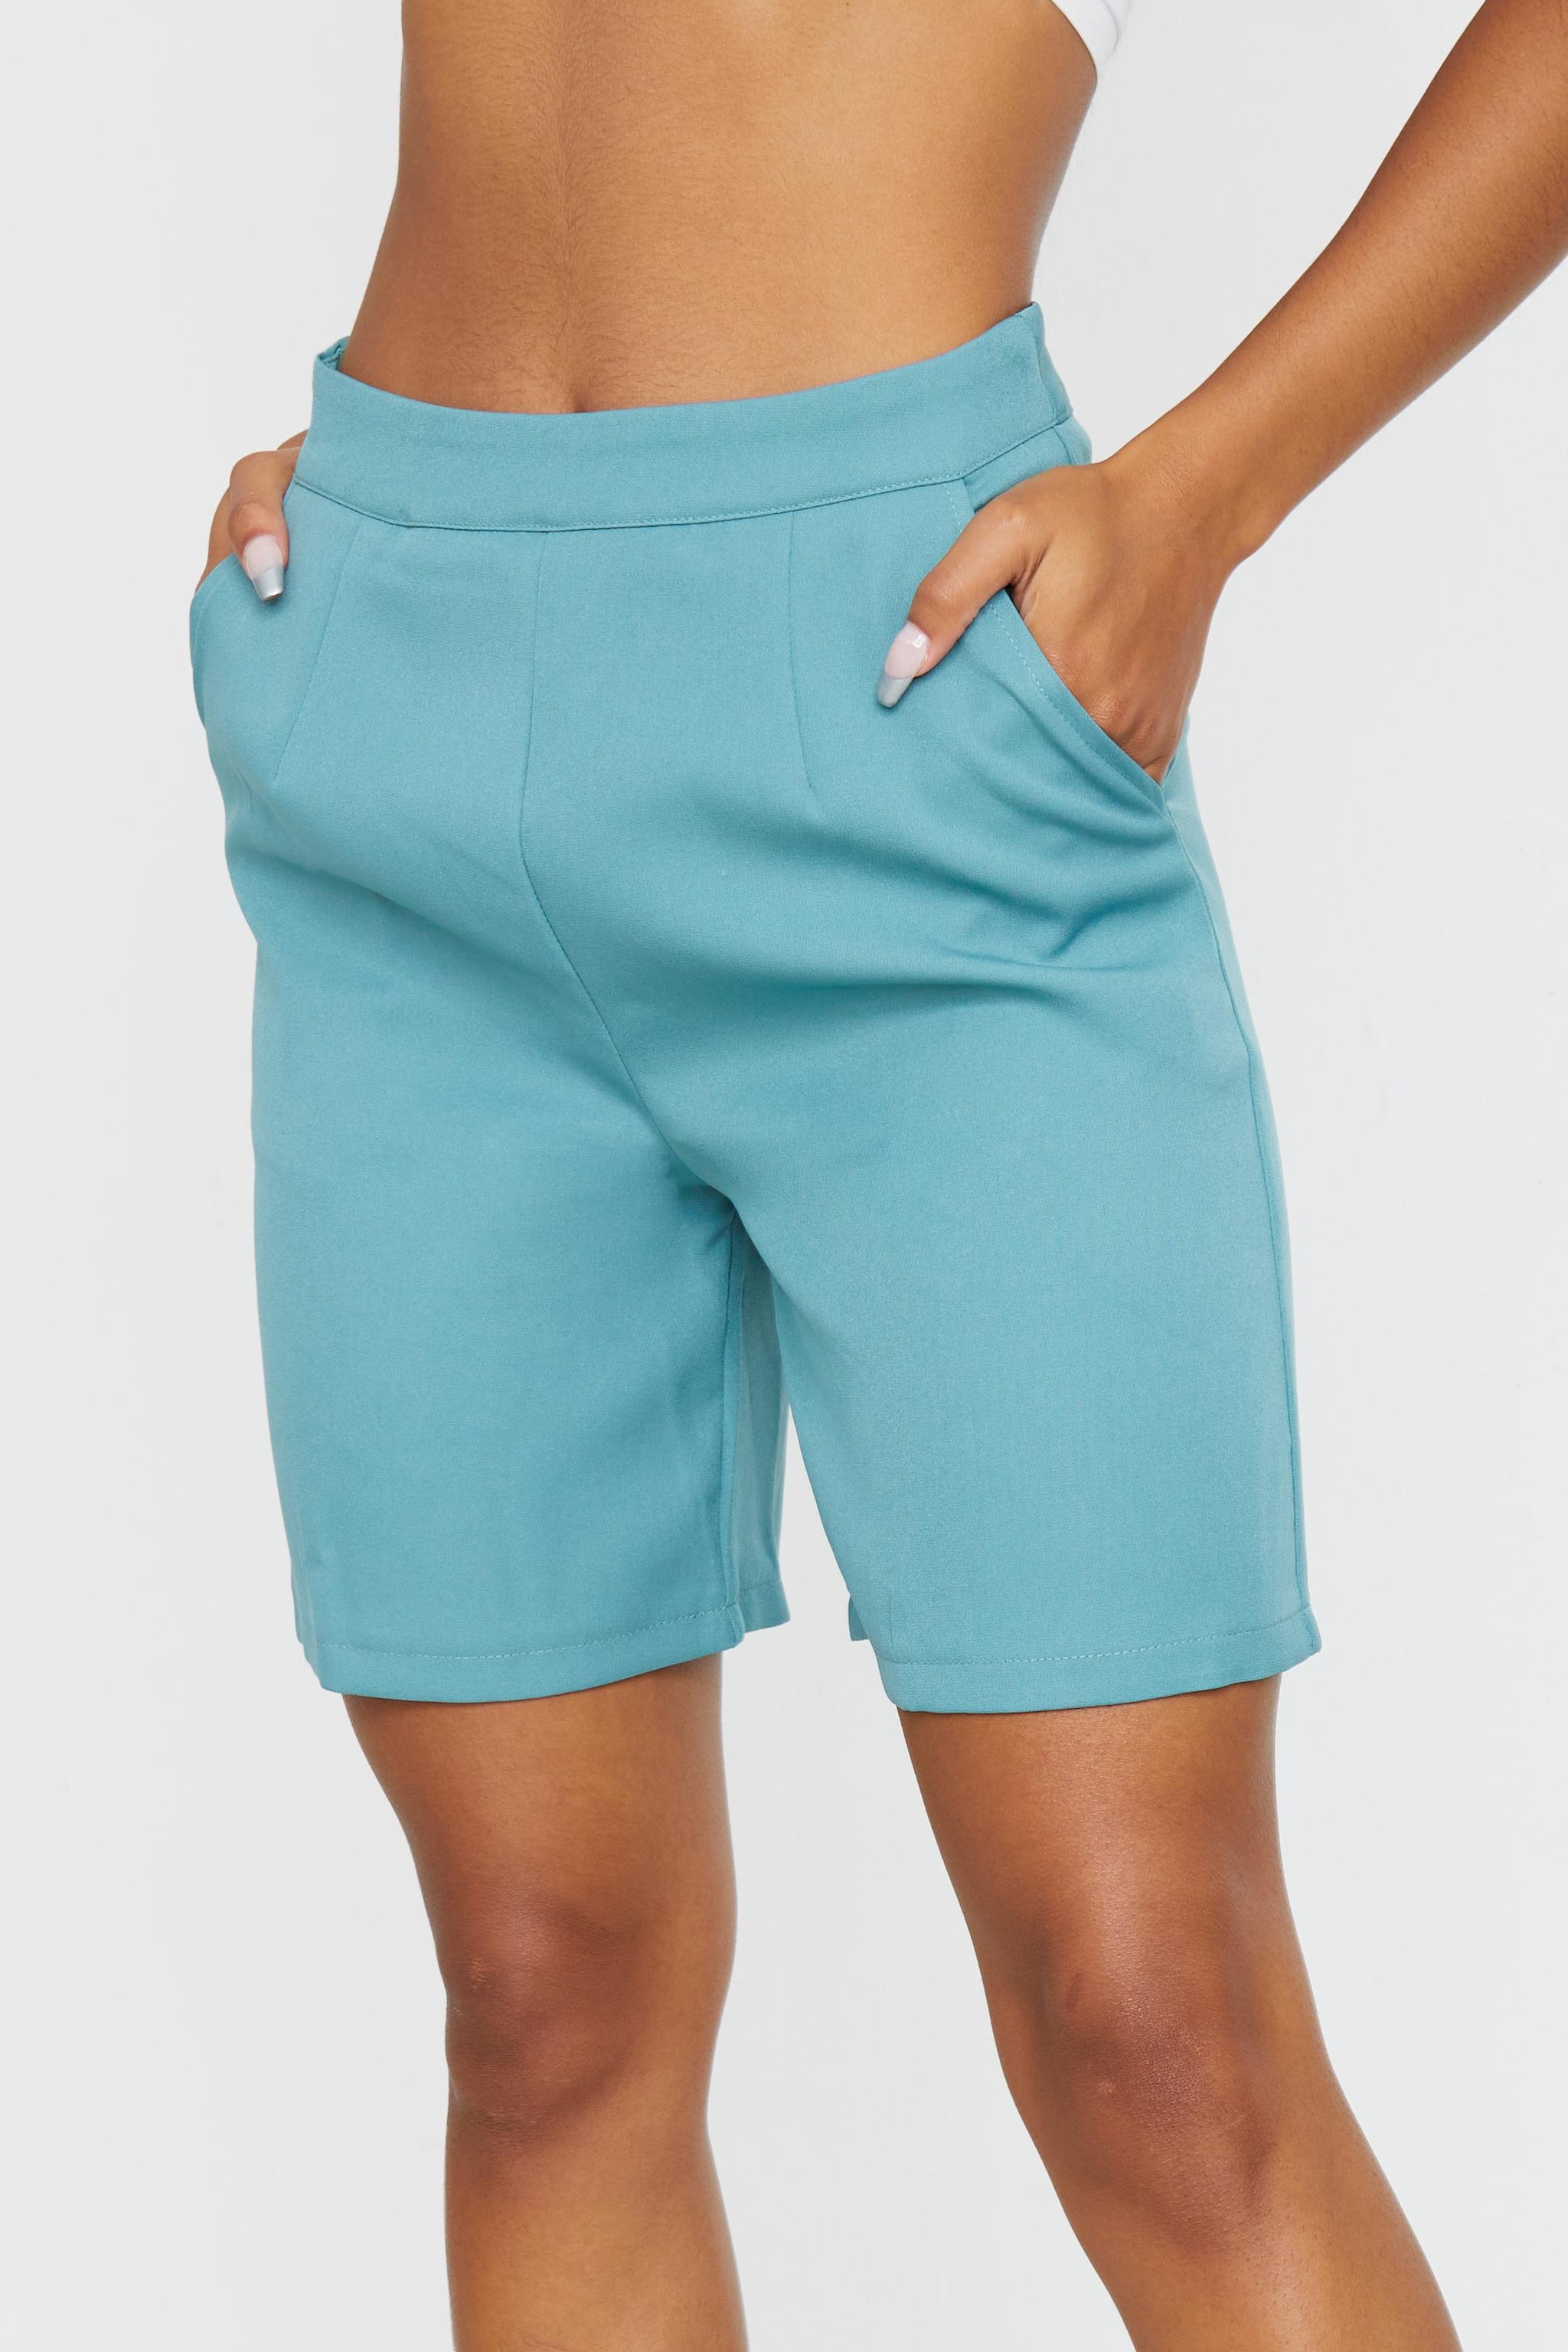 Sage Blue Woven Pocket Detail City Shorts 5